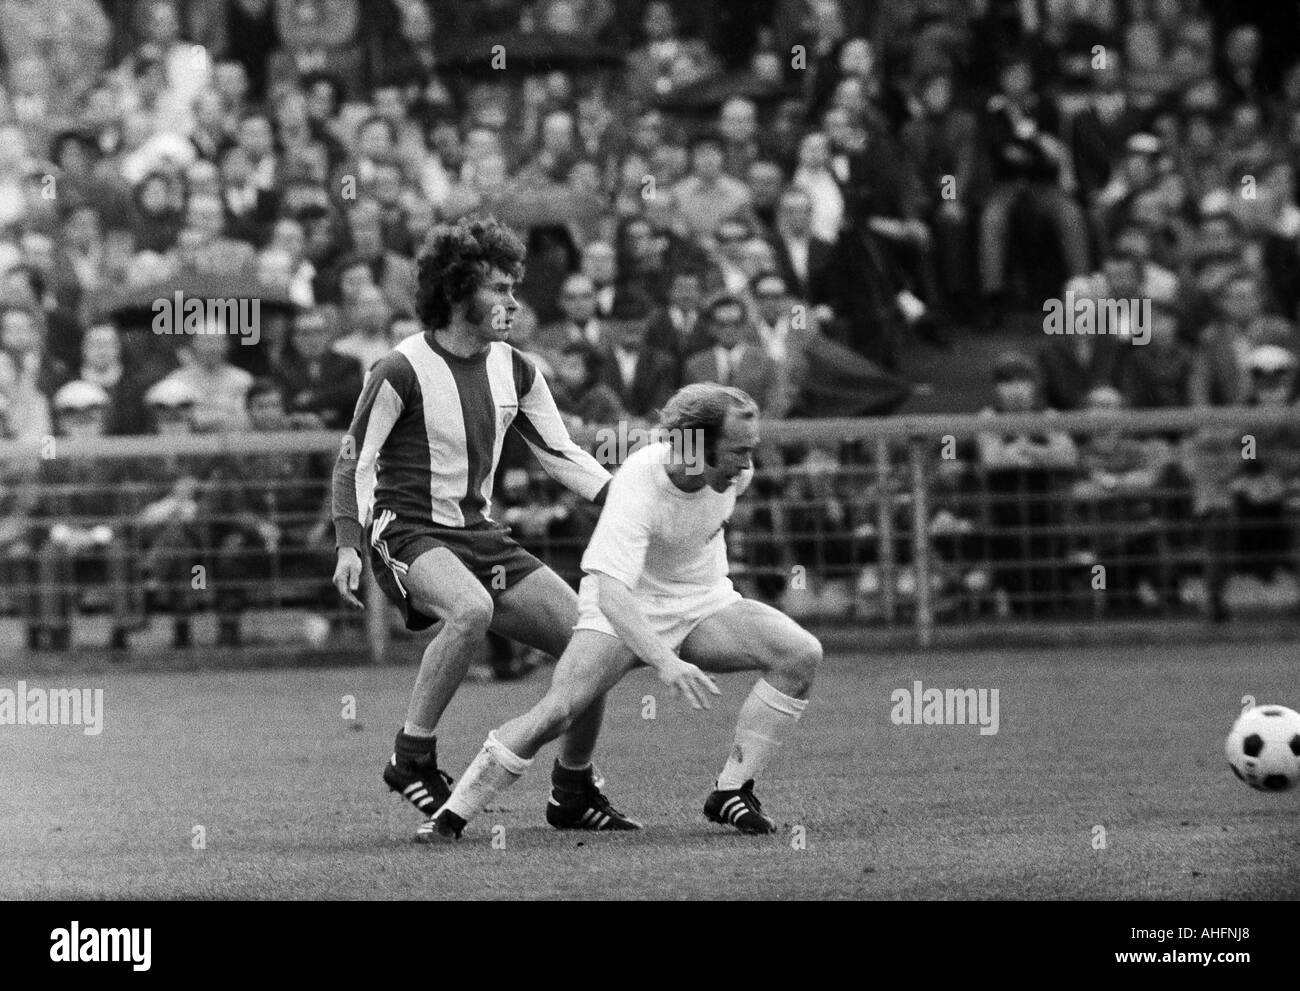 football, Bundesliga, 1971/1972, Stadium Radrennbahn near the Muengersdorfer Stadium in Cologne, 1. FC Cologne versus FC Bayern Munich 1:4, scene of the match, duel between Paul Breitner (FCB) left and Bernd Rupp (Koeln) - Stock Image